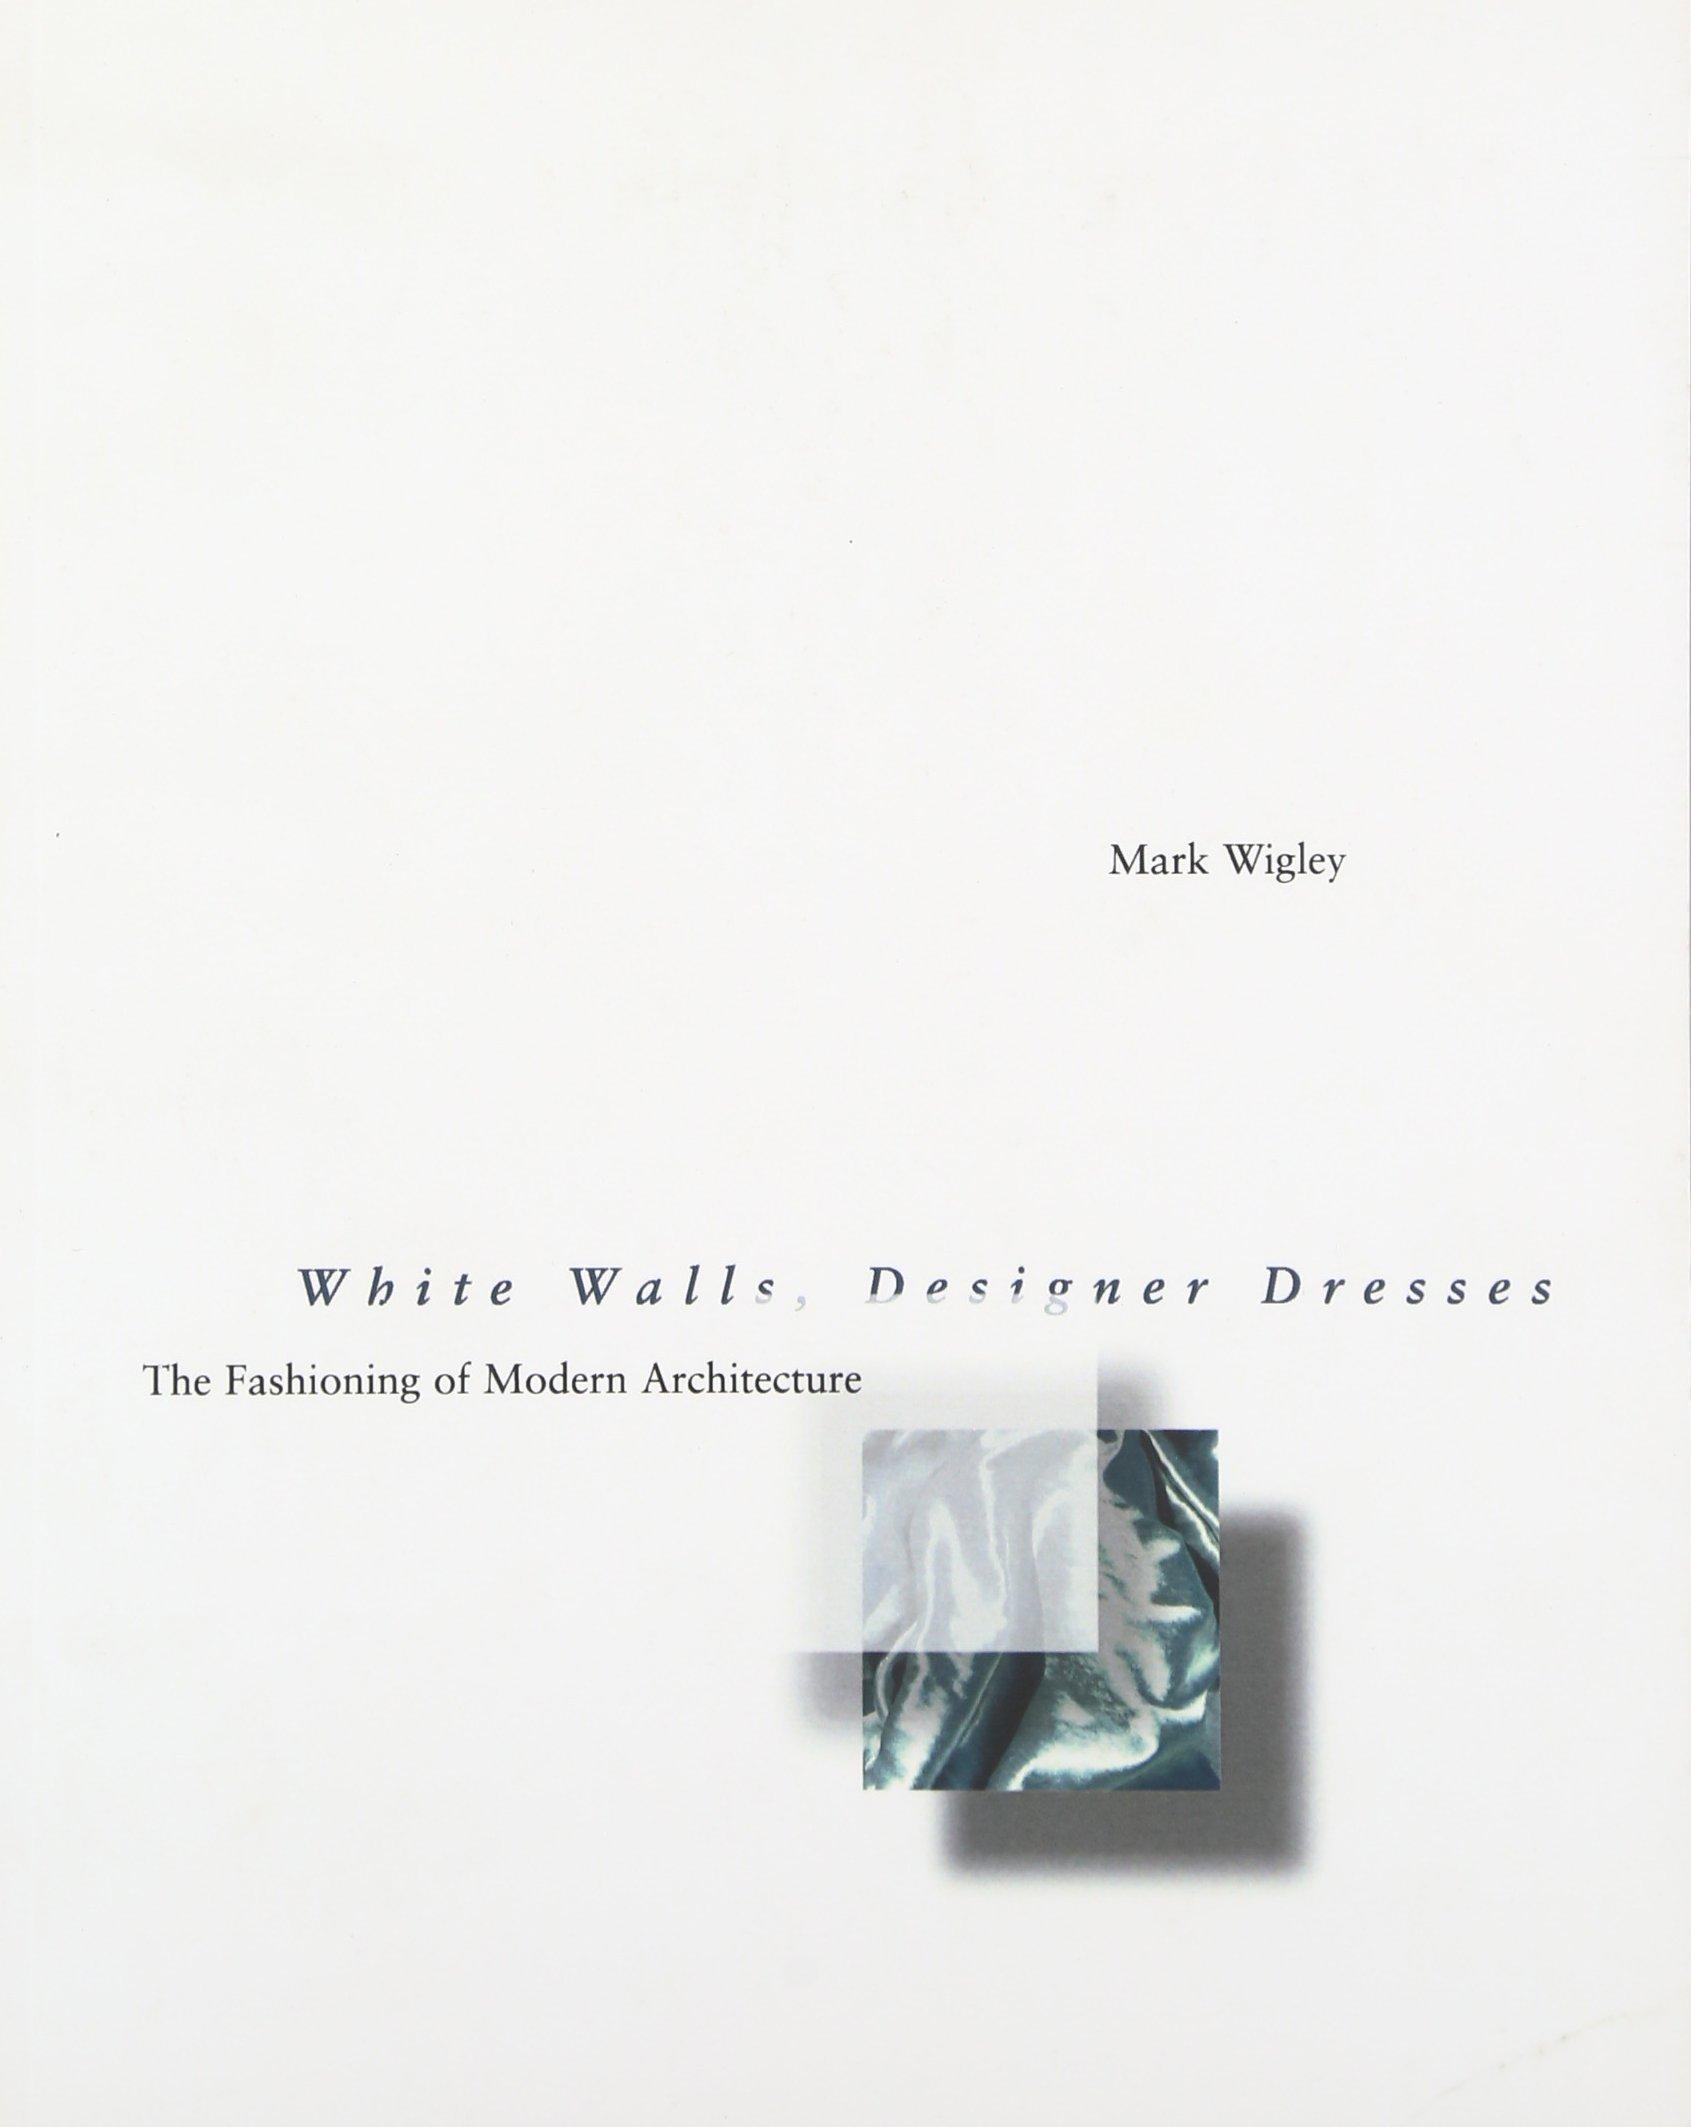 White Walls, Designer Dresses: The Fashioning of Modern Architecture (Mit Press)